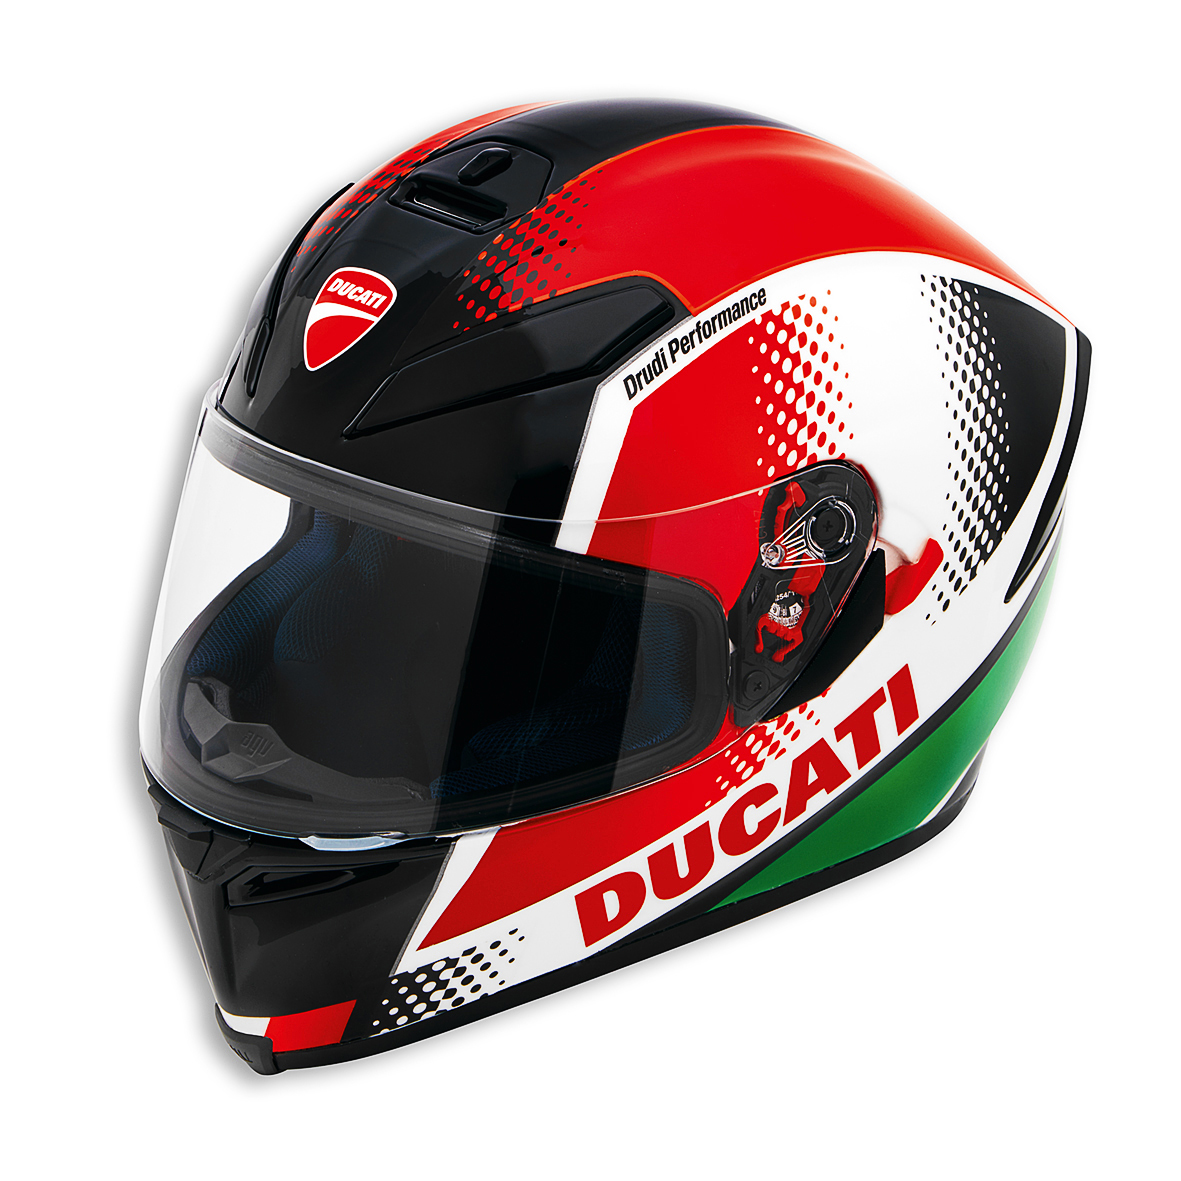 Ducati Helme Ducati Shop